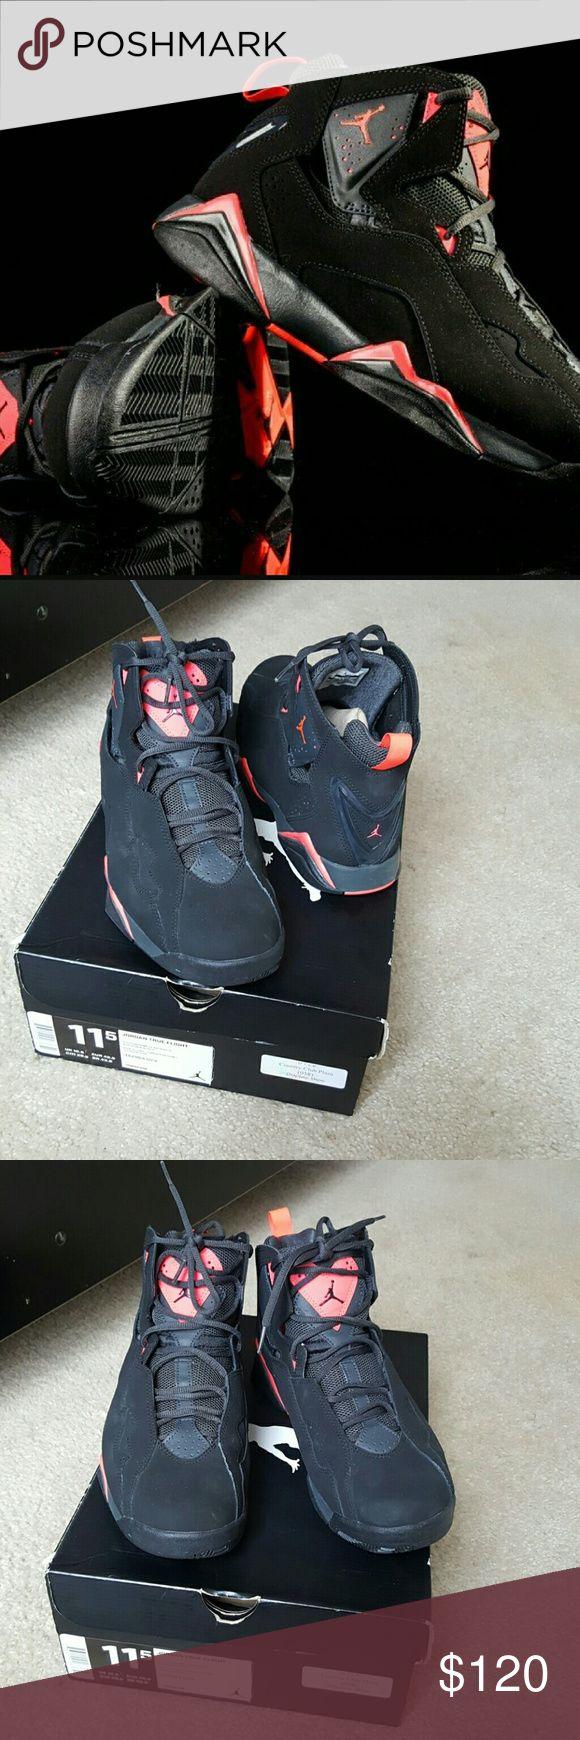 Jordan True Flight Authentic Jordans Very Good Condition Jordan Shoes Sneakers